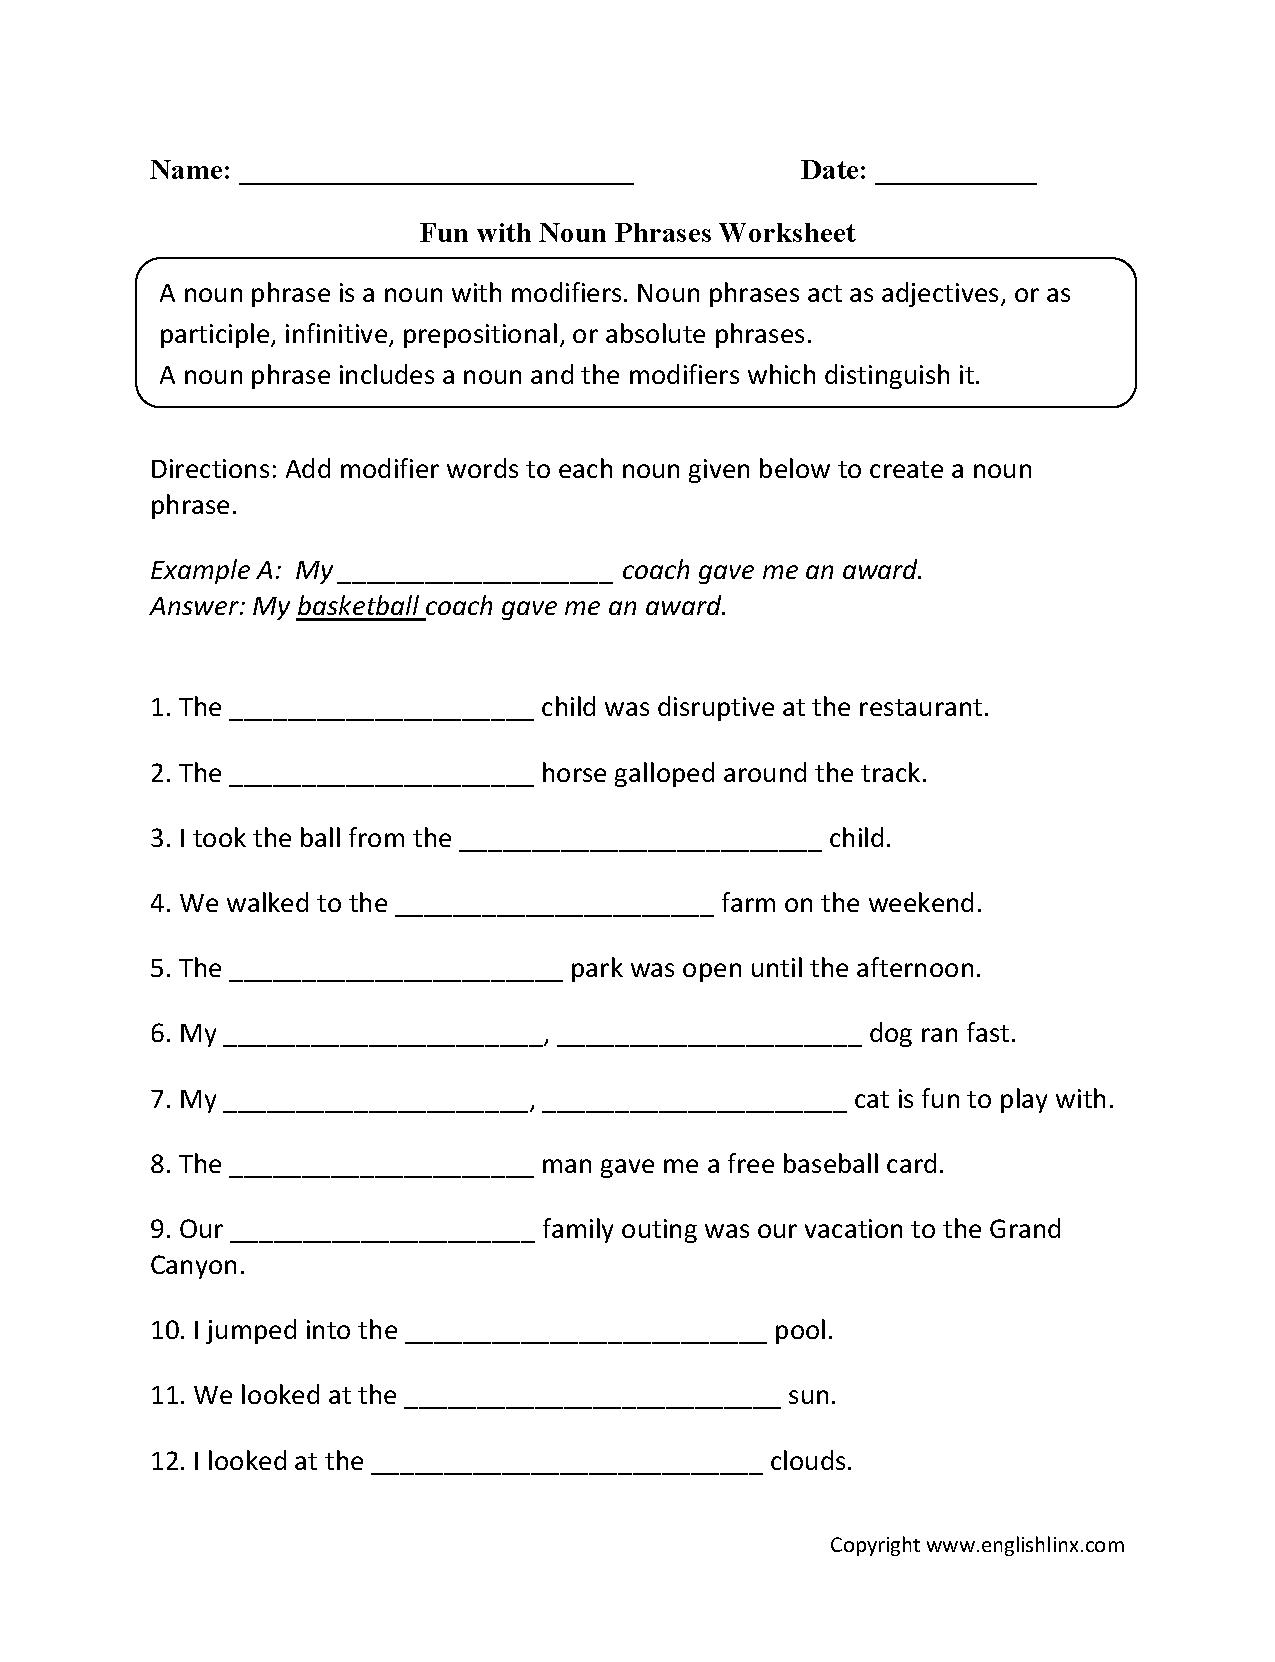 Fun With Noun Phrases Worksheets